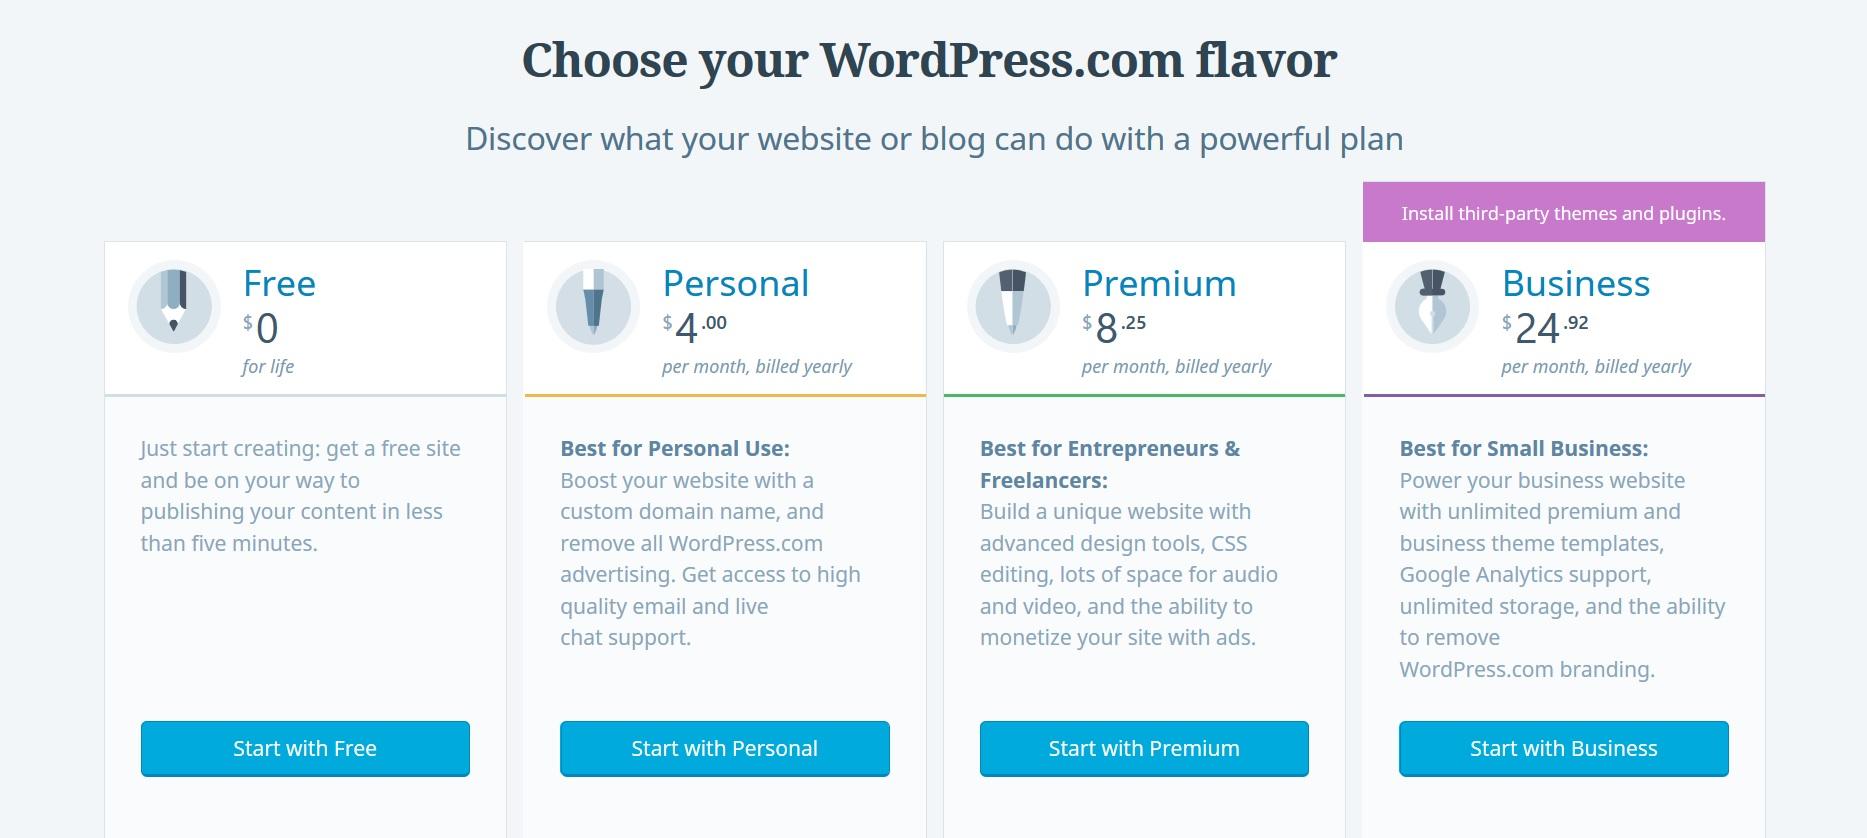 Cac goi dich vu tao web - blog cua WordPress com